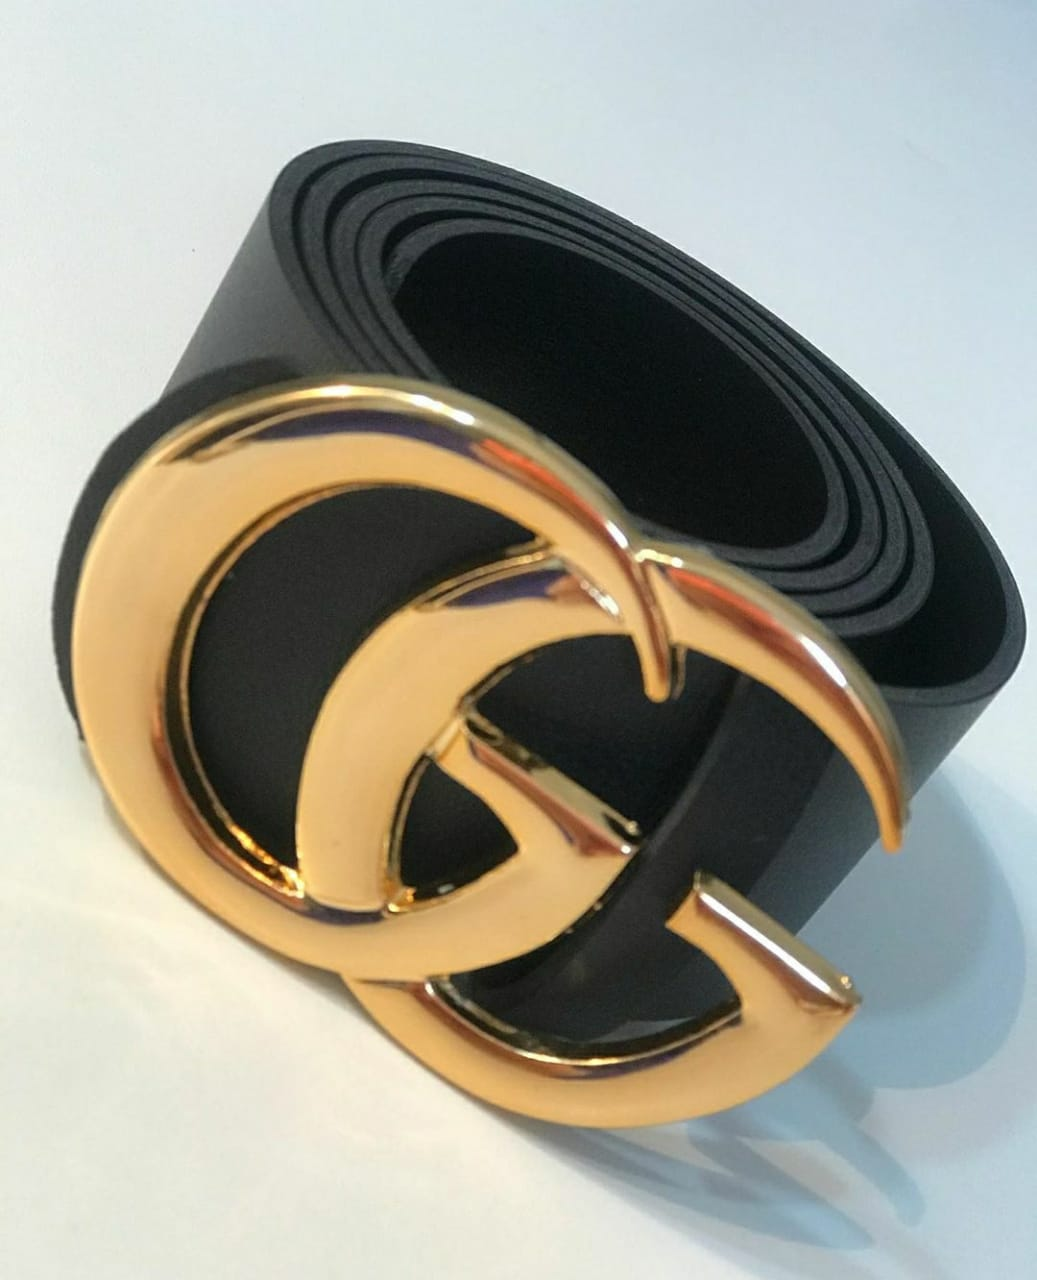 Cinto Inspired GUC Fivela Dourada NDD 02